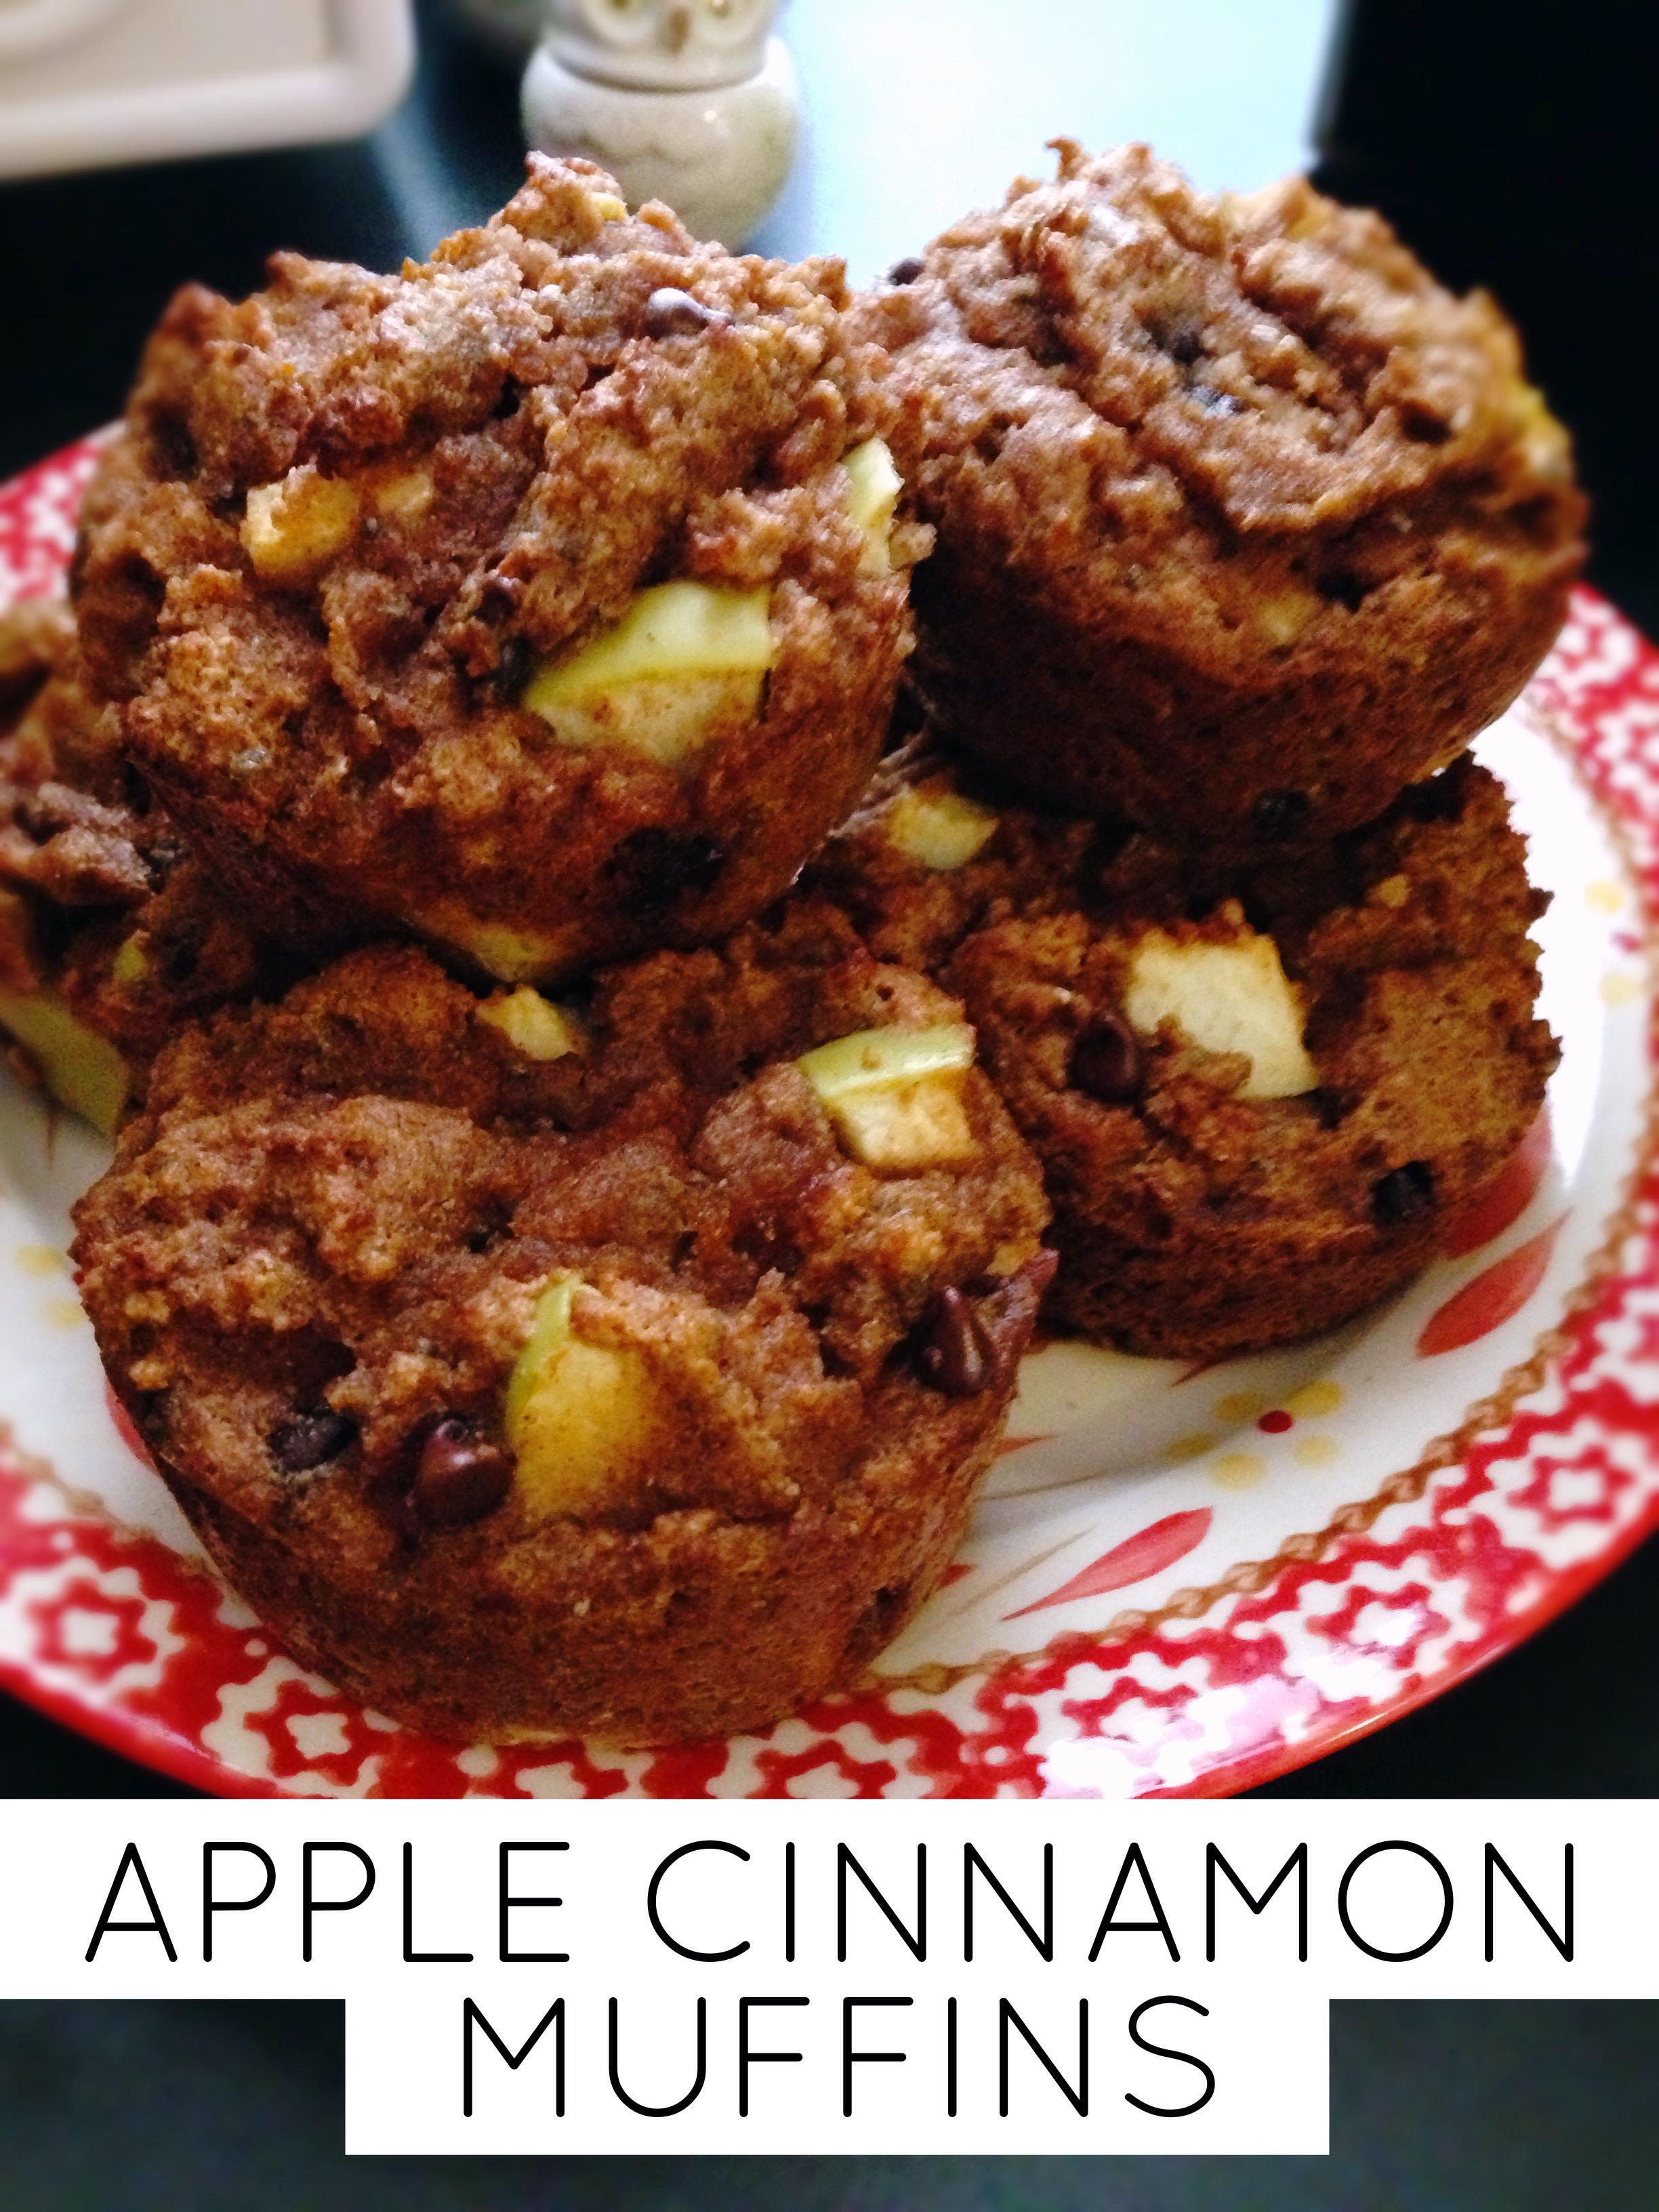 clean apple cinnamon muffins